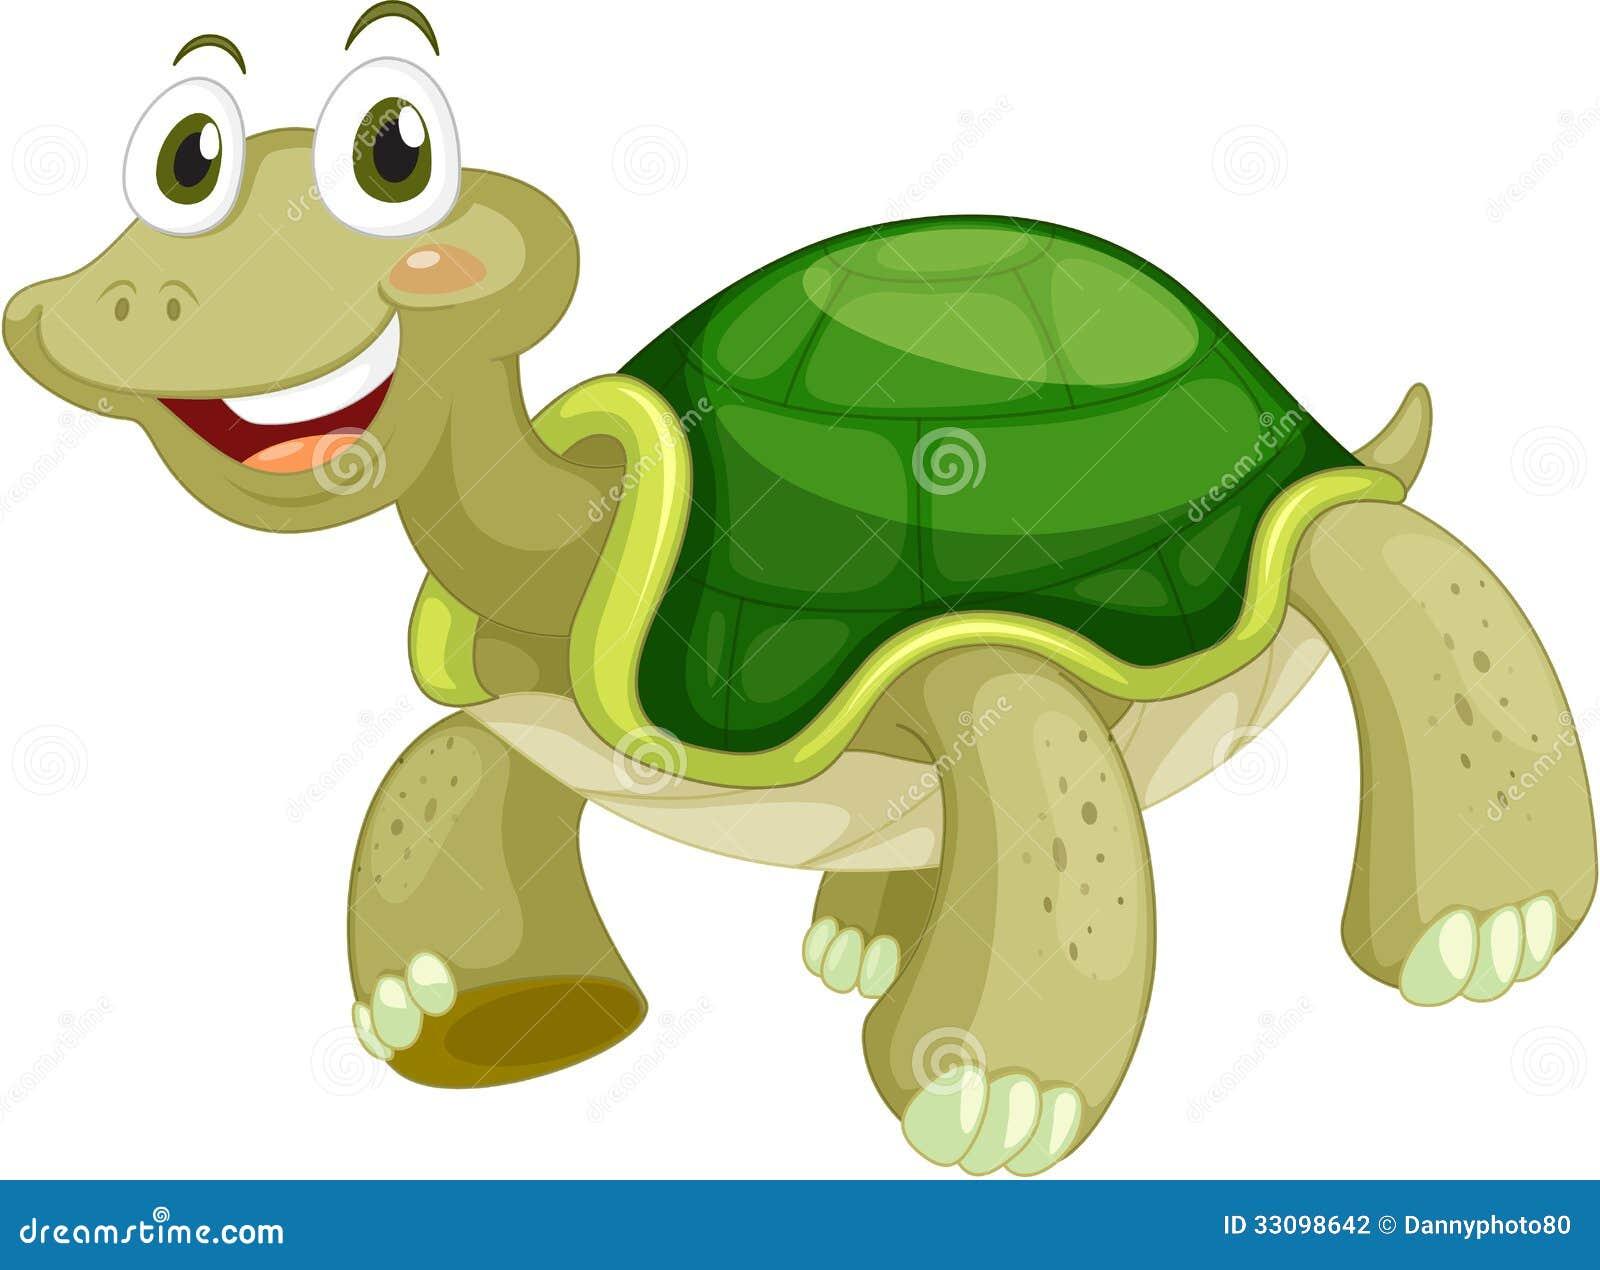 Animated Turtle Stock Photography Image 33098642